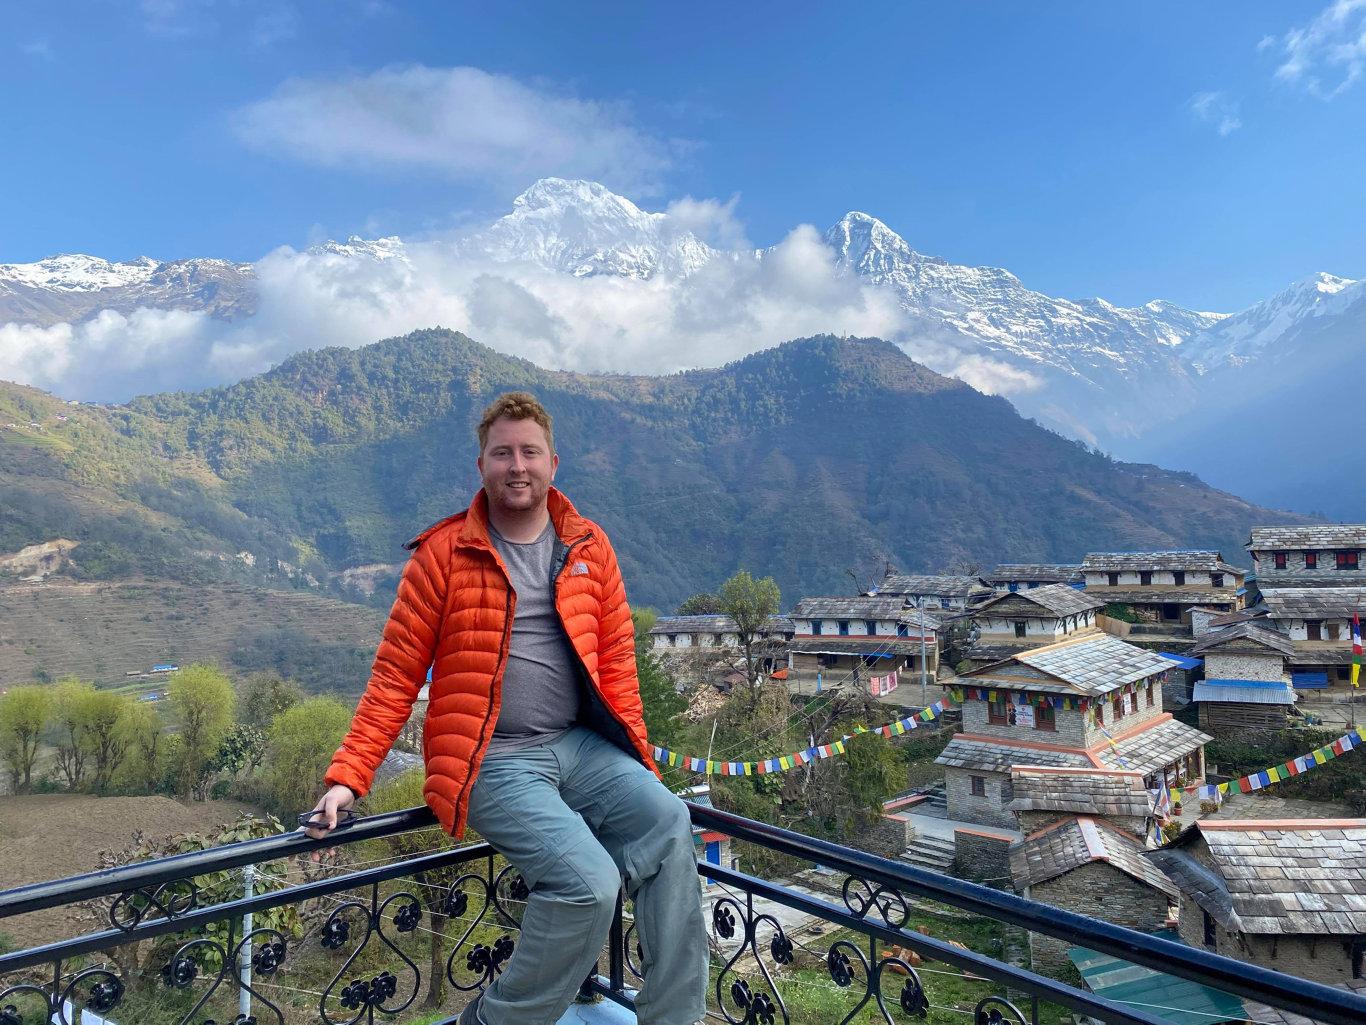 The Chronicle digital producer Tobi Loftus in the Annapurna region in Nepal.